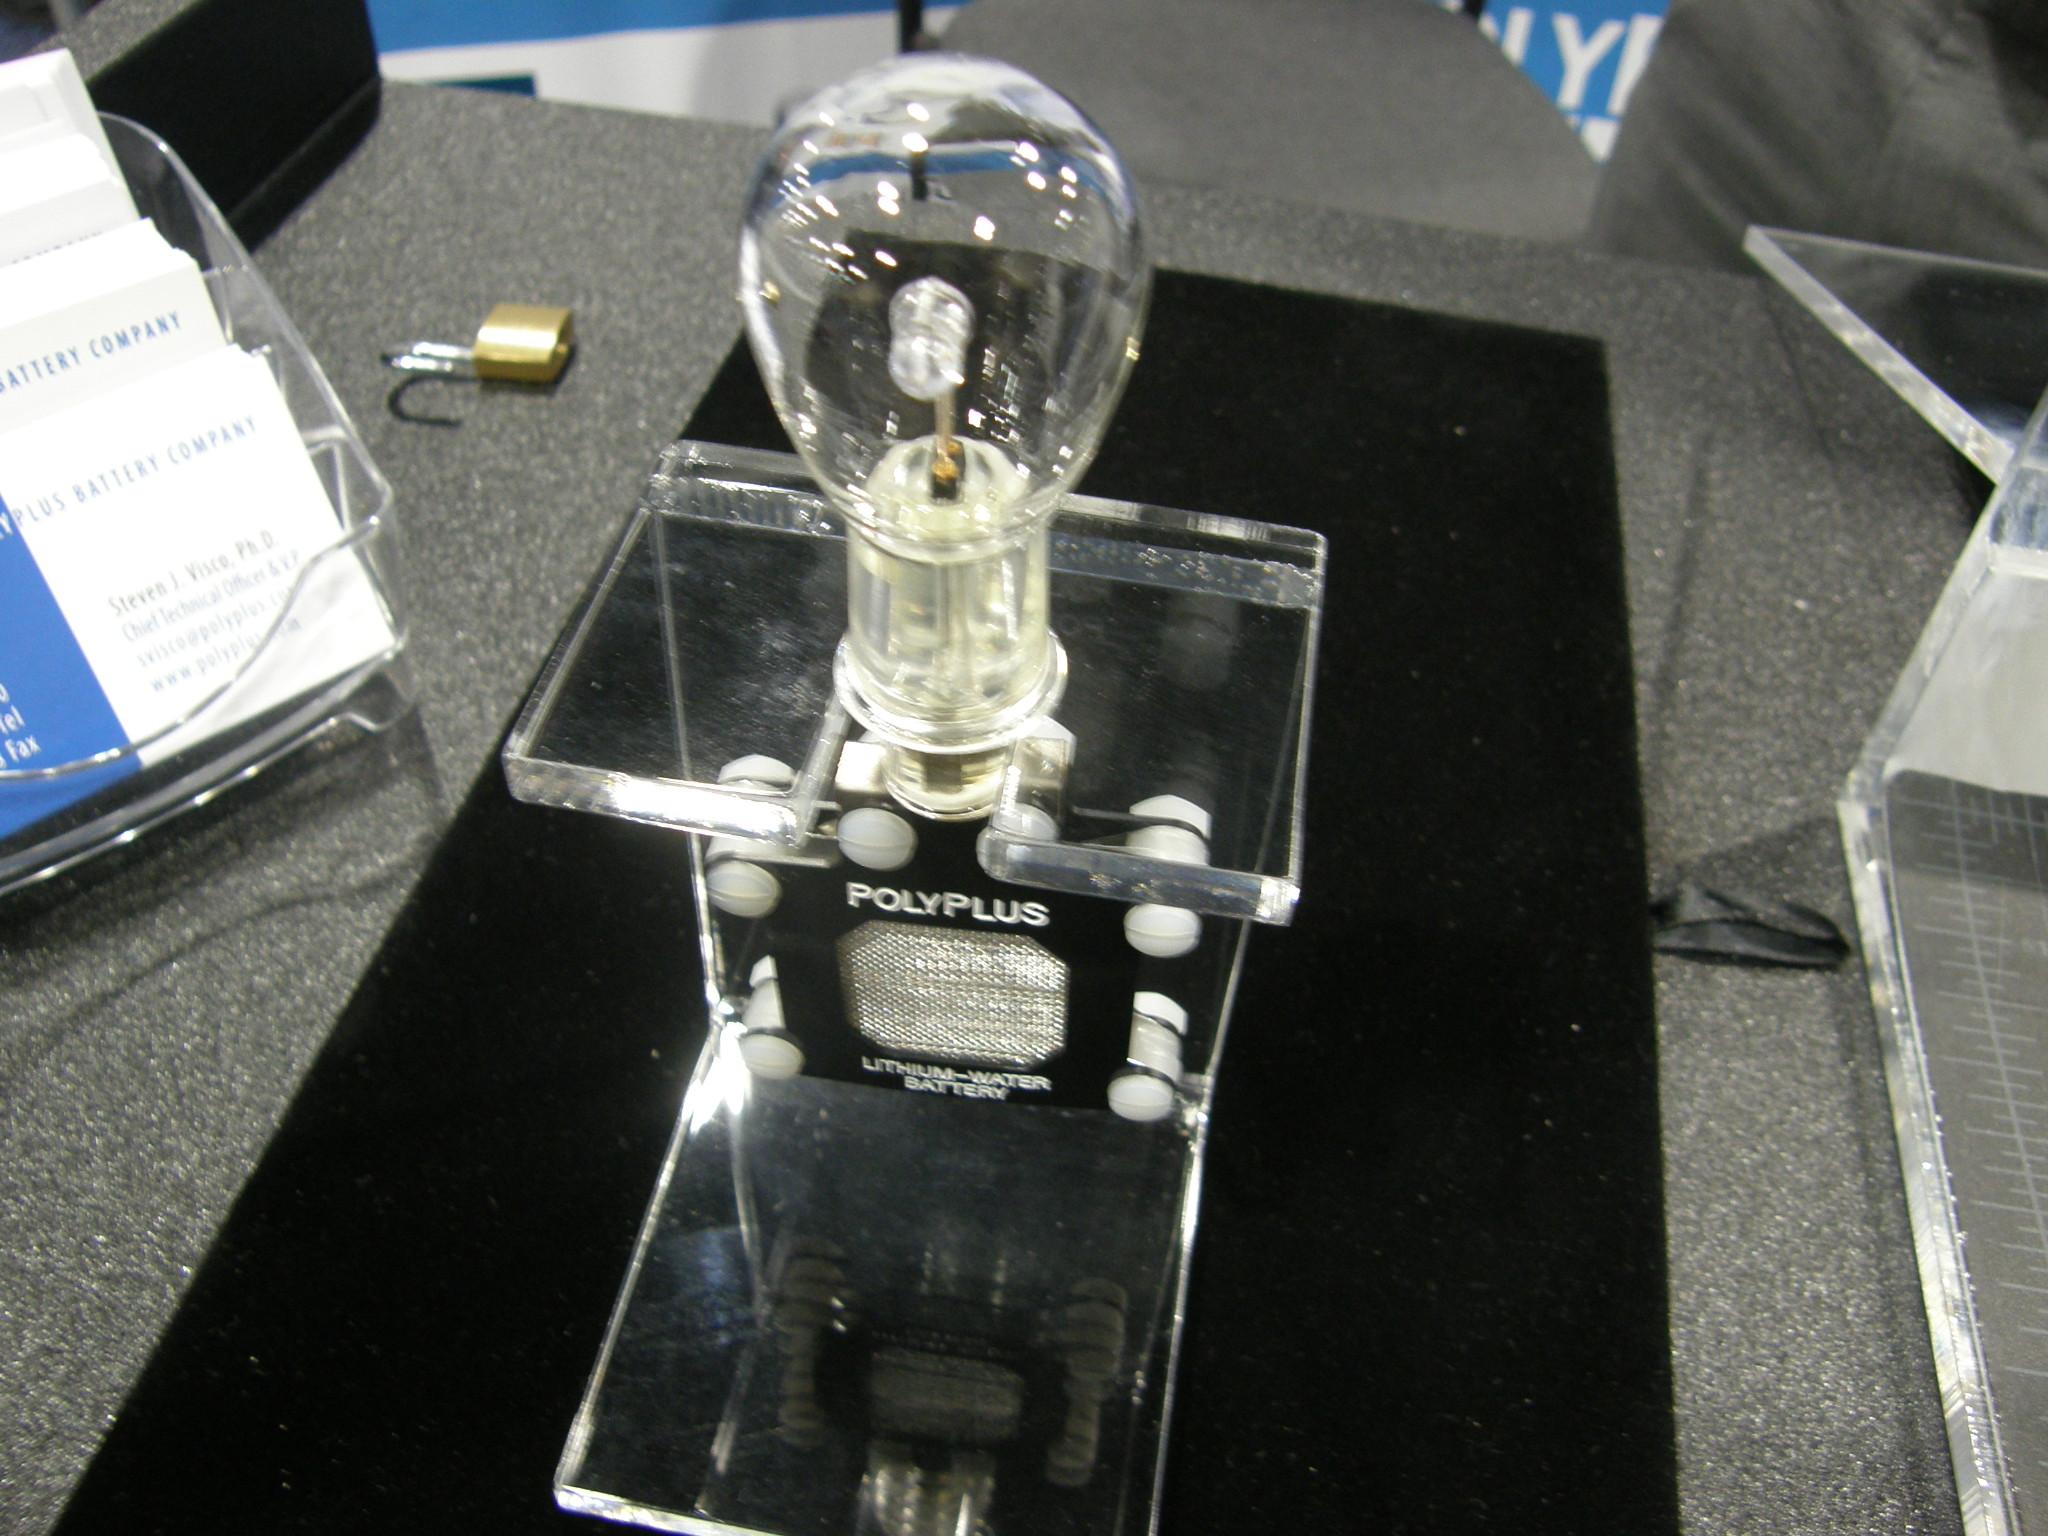 PolyPlus Water Battery